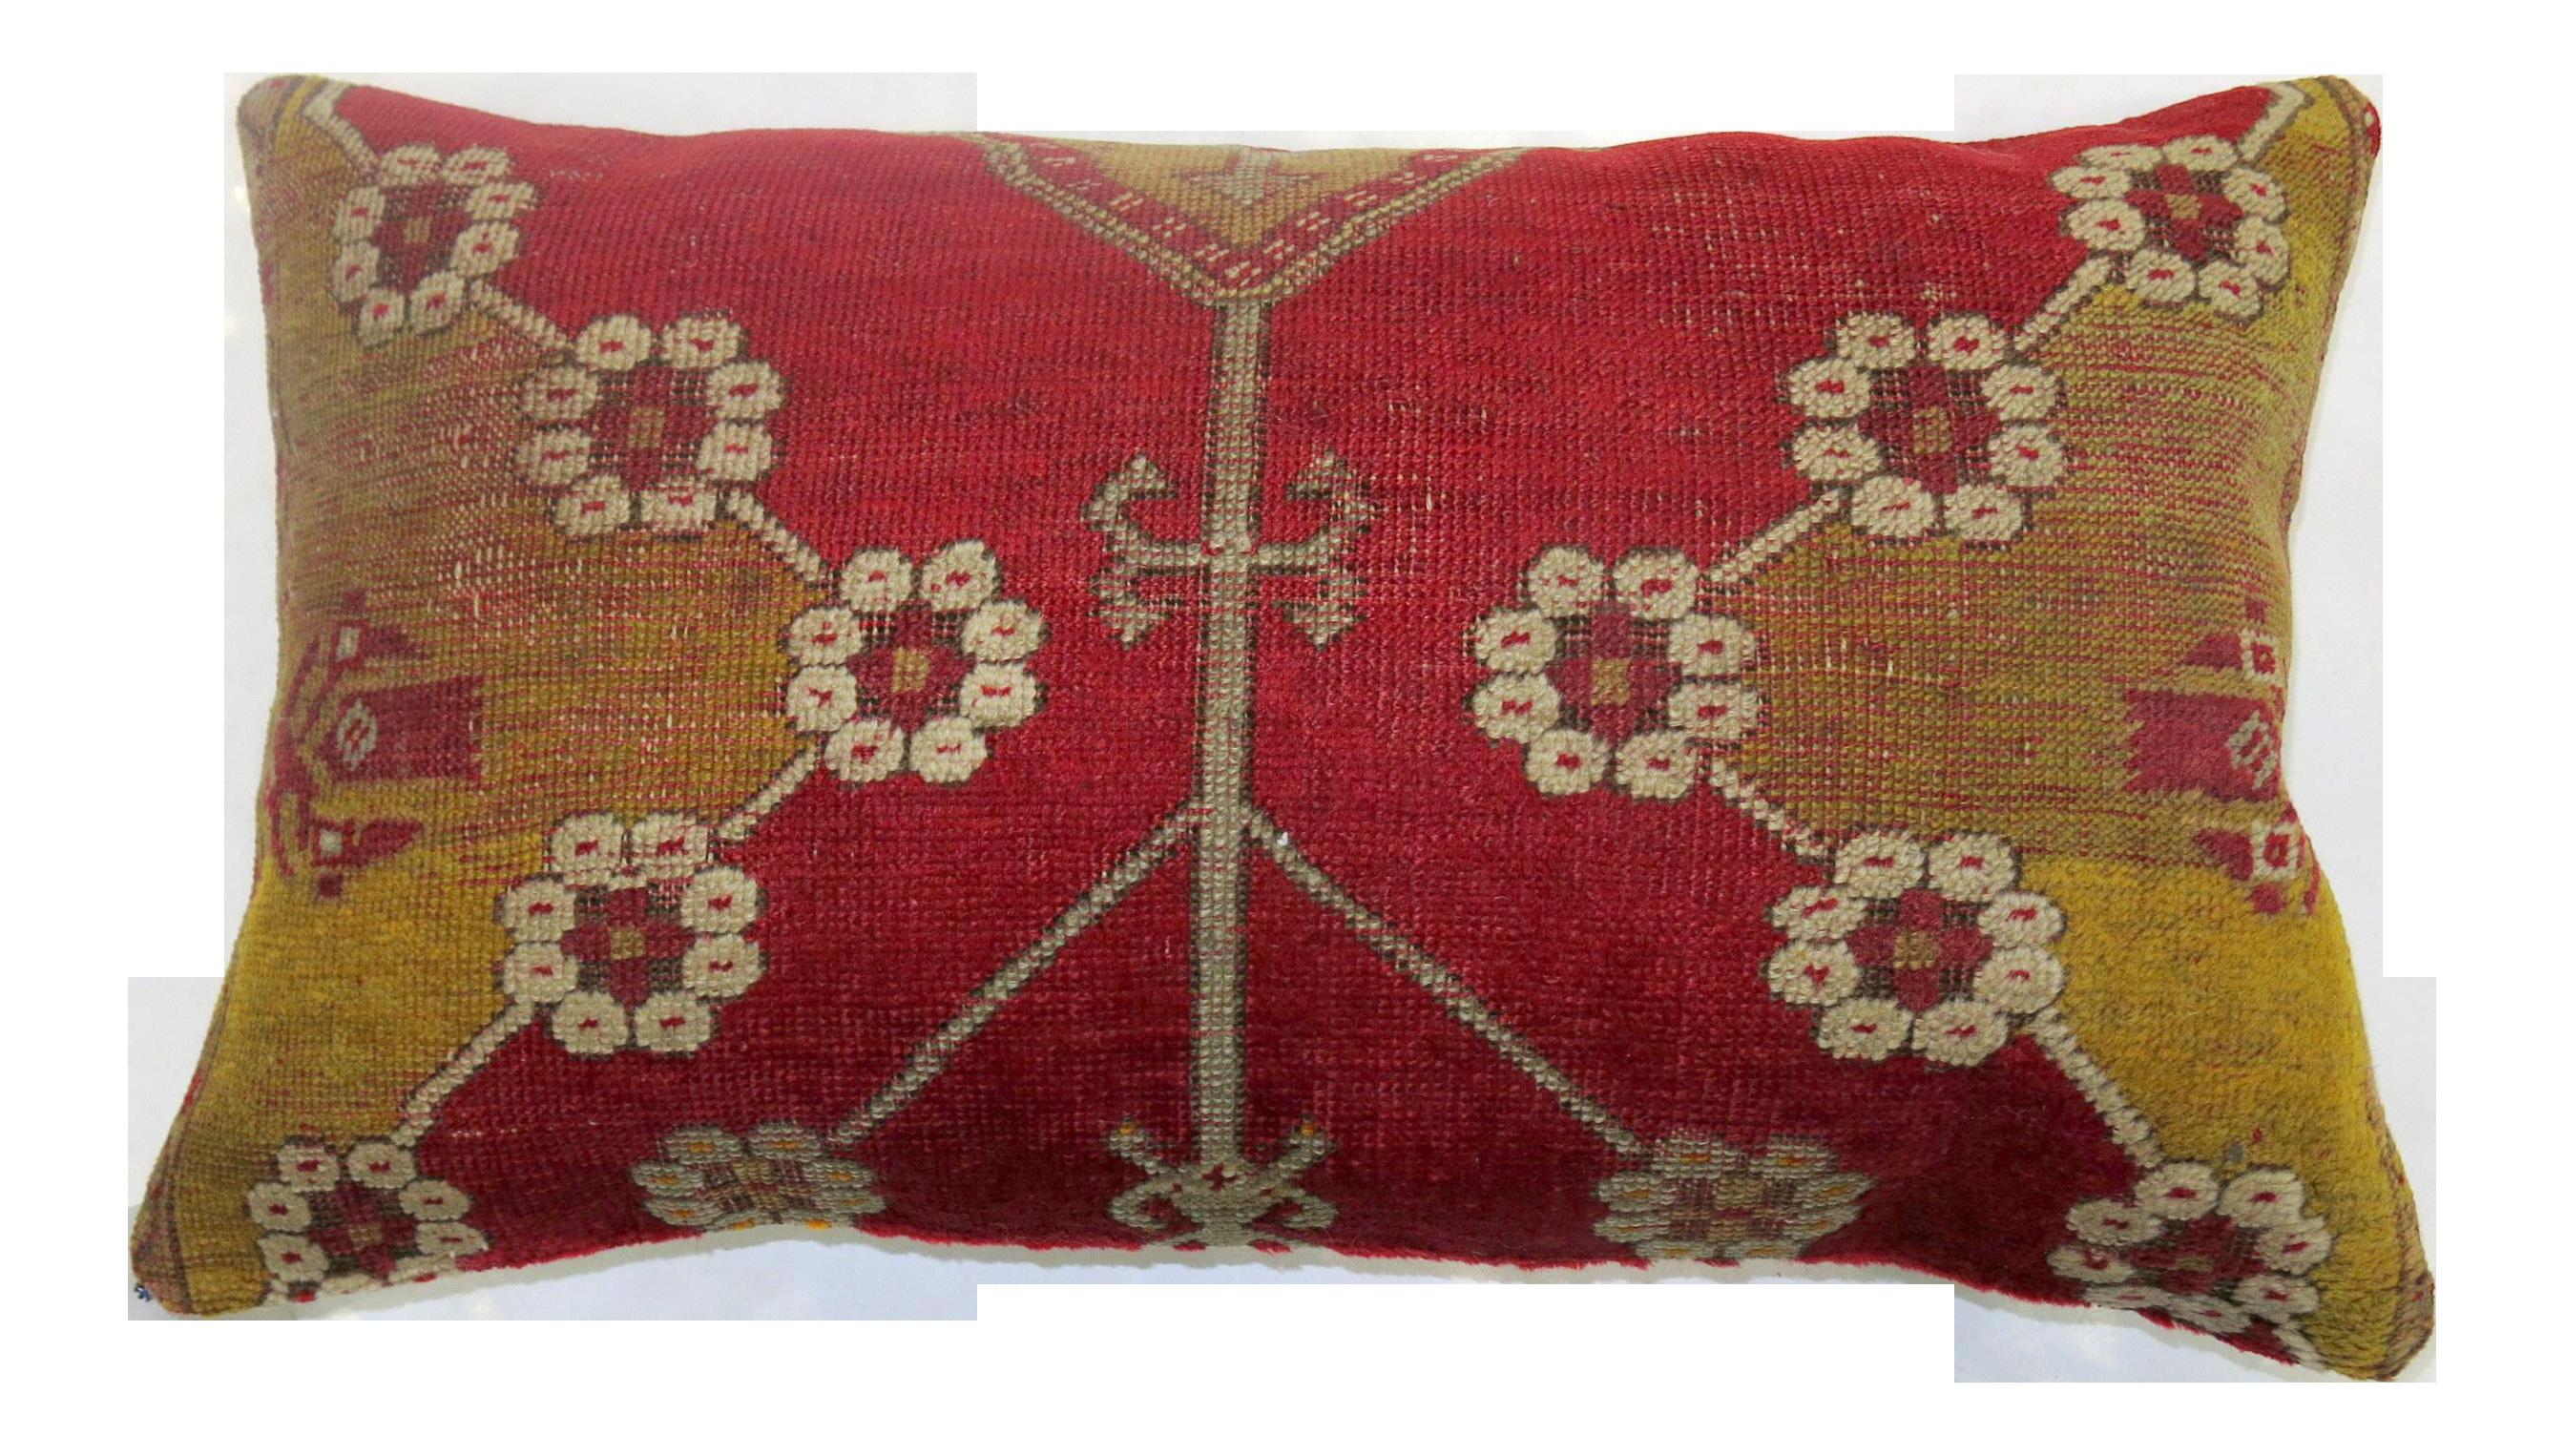 Vintage Boho Chic Floor Rug Pillow Chairish